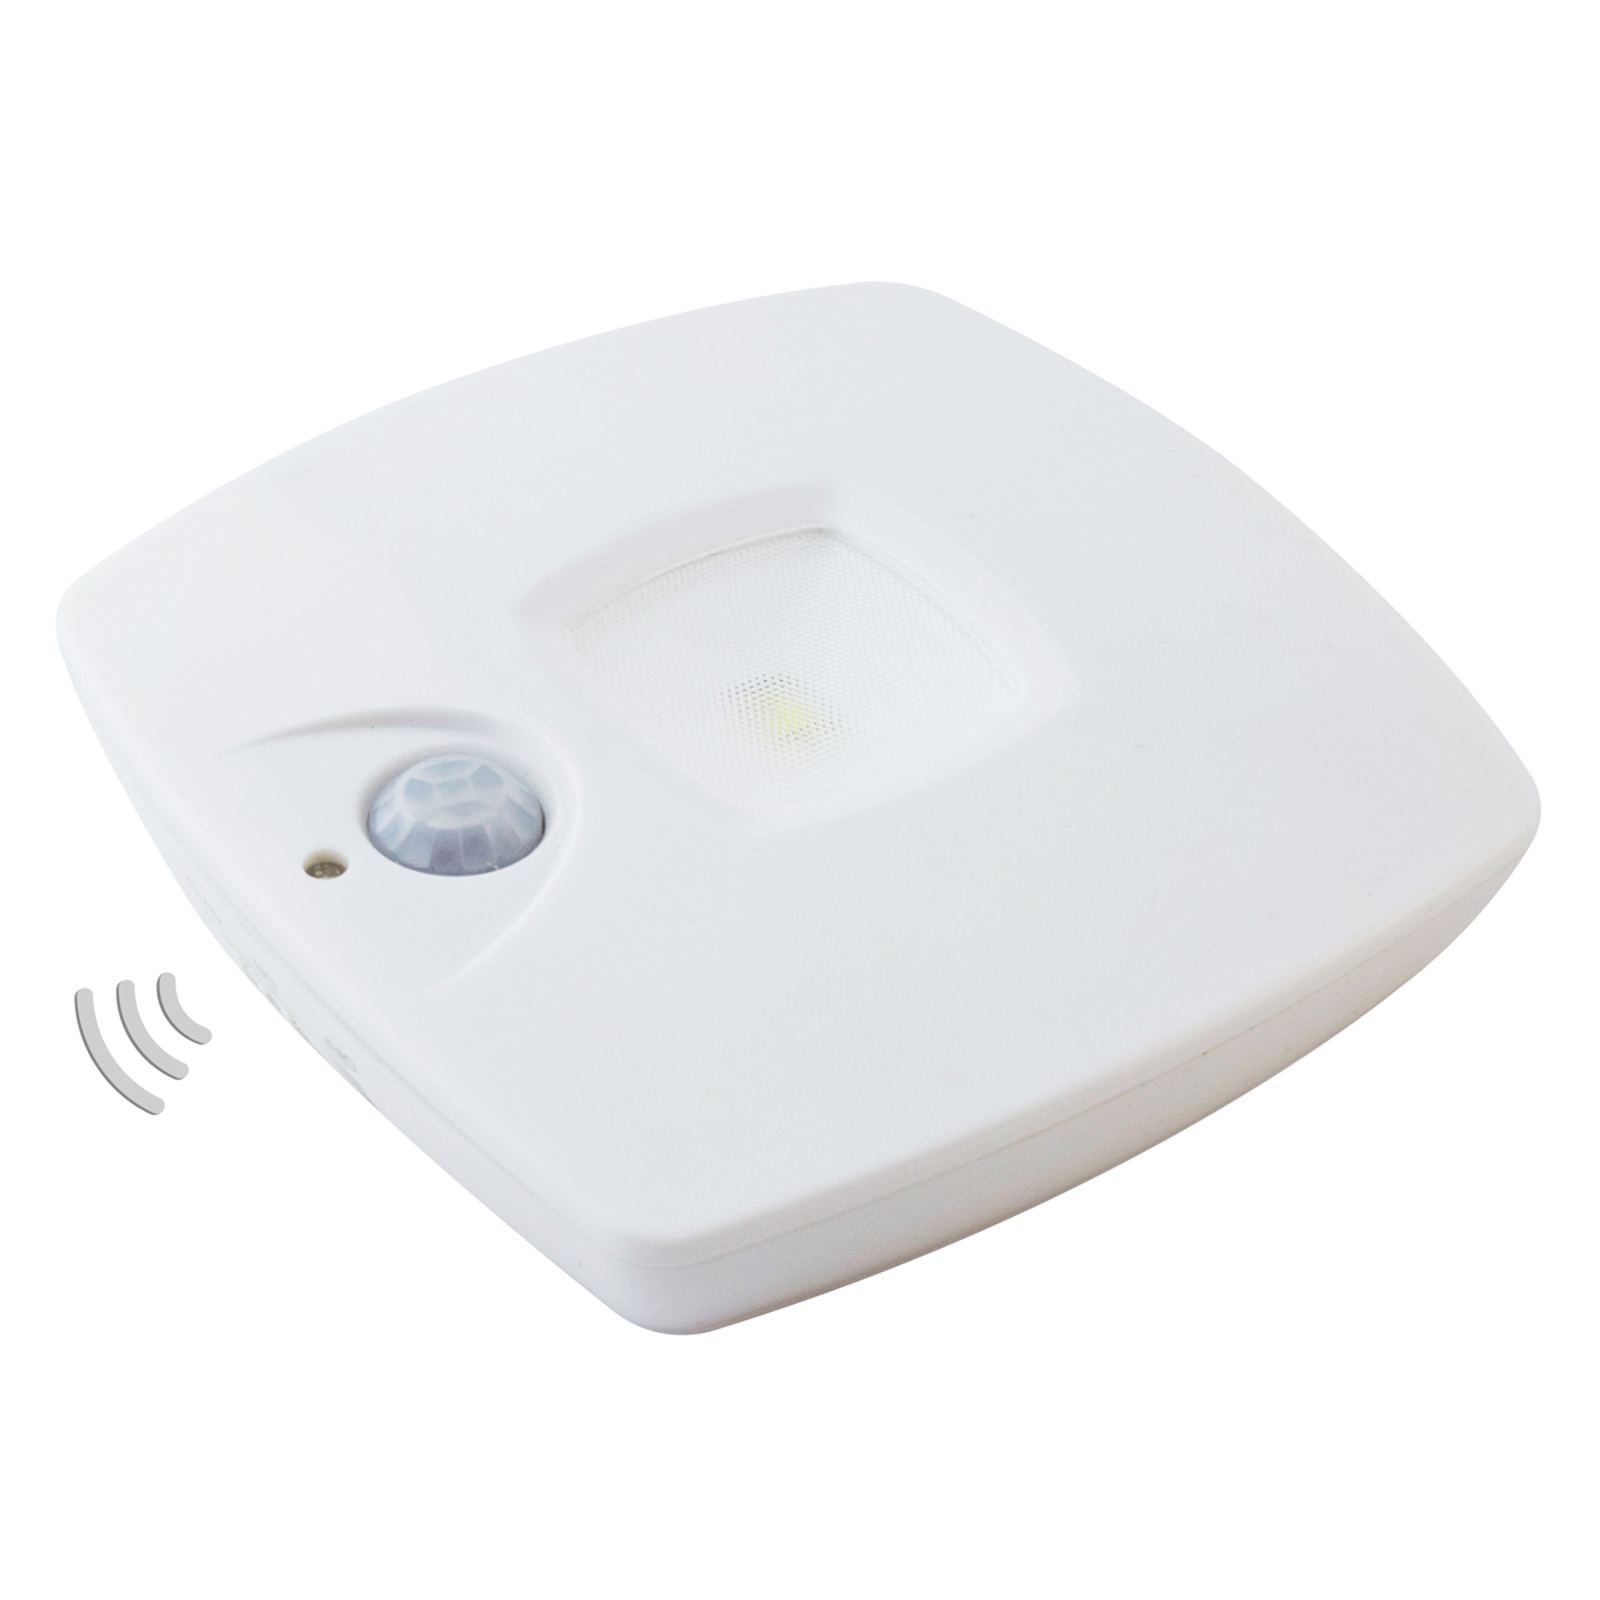 Batteriebetr. LED-Nachtlicht Nightlight Sensor